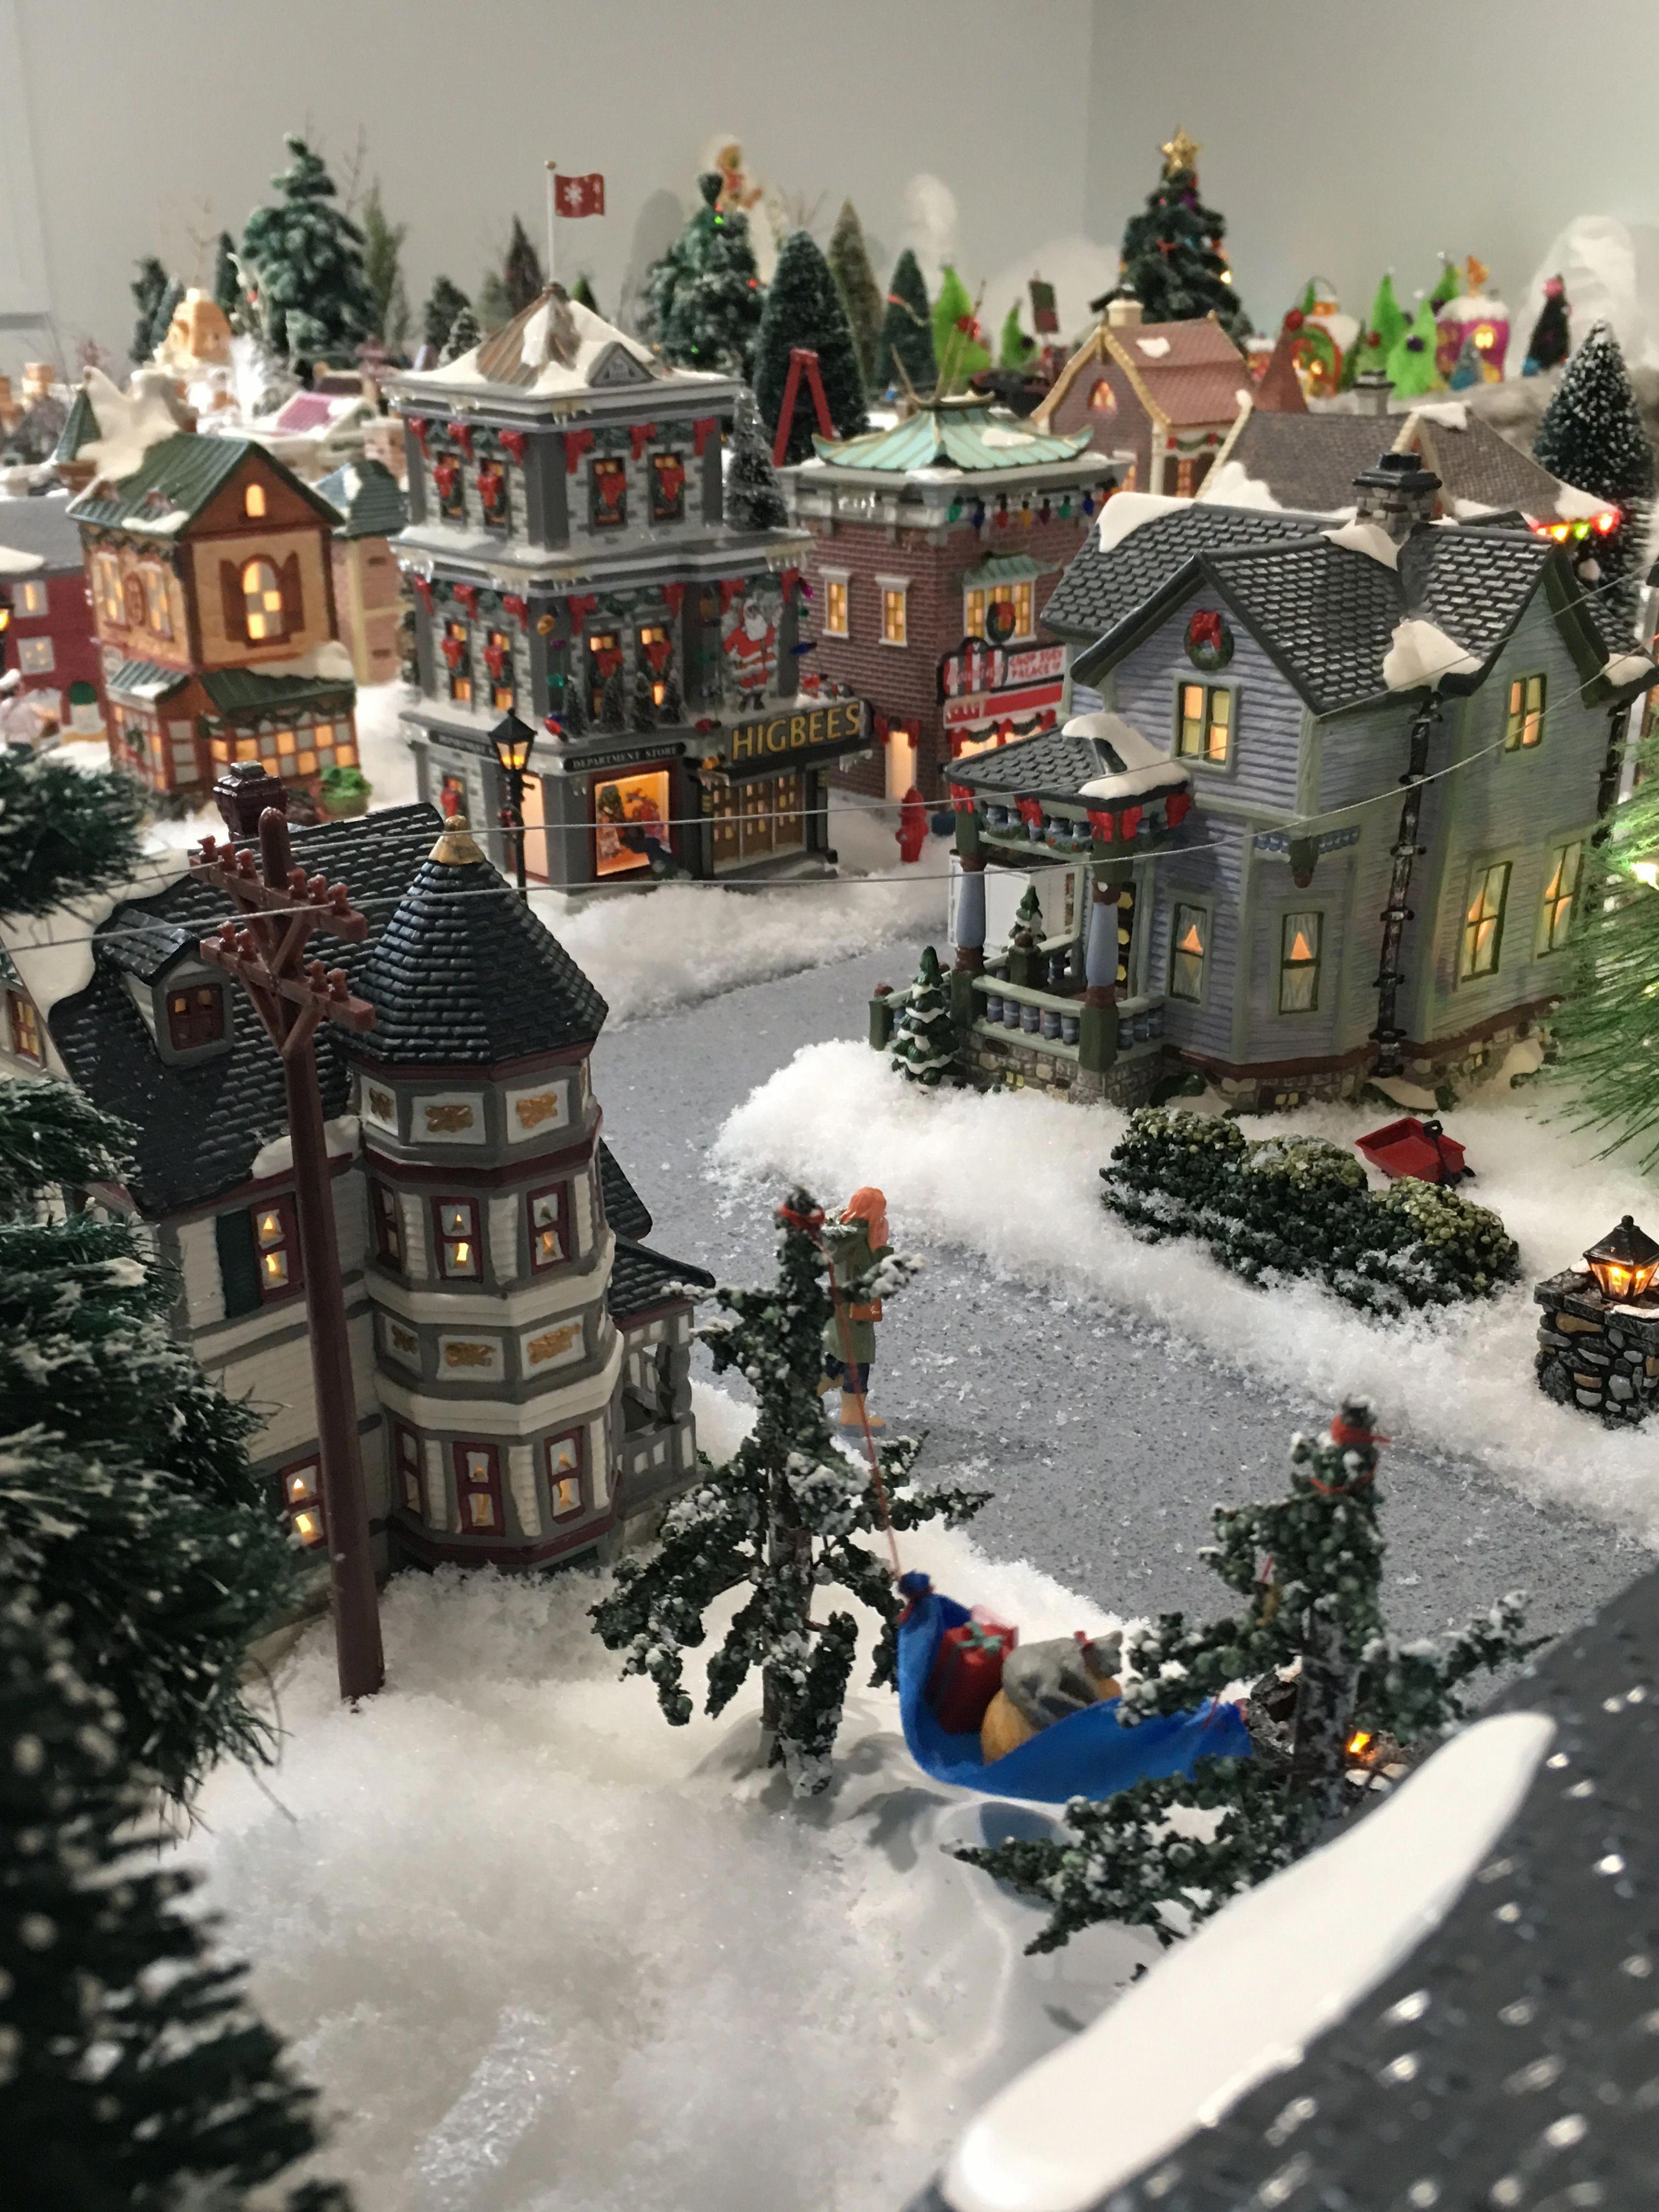 model trains plans | Christmas village display, Christmas villages